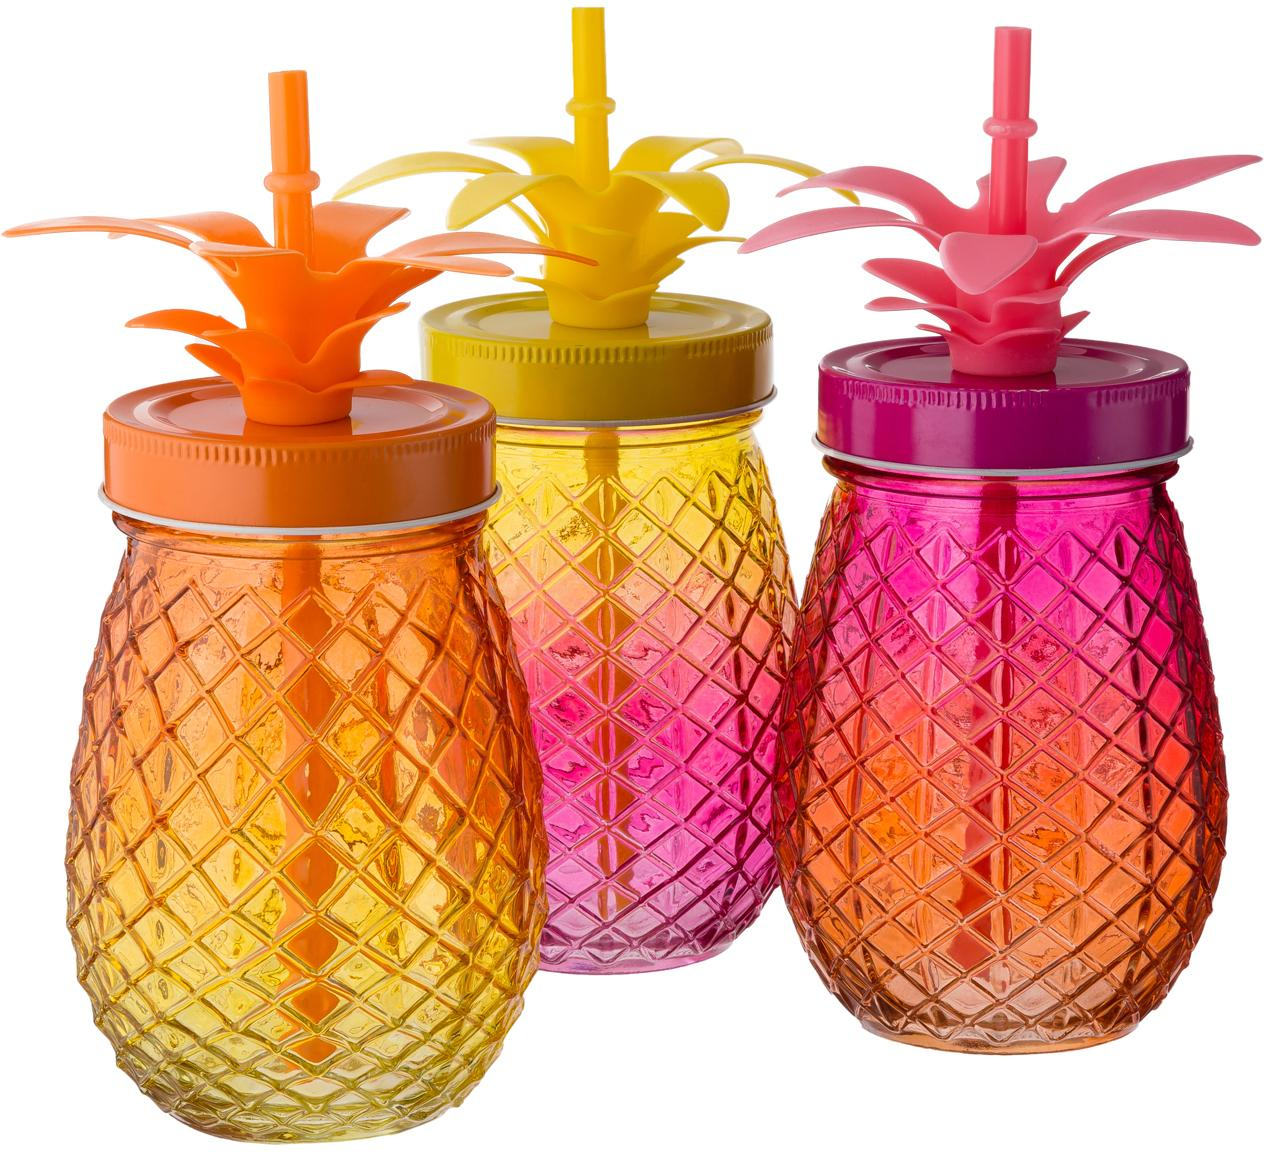 Trinkgläser-Set Pineapples, 3-tlg., Trinkglas: Glas, Deckel: Metall, Strohhalm: Kunststoff, Pink, Orange, Gelb, Ø 9 x H 14 cm